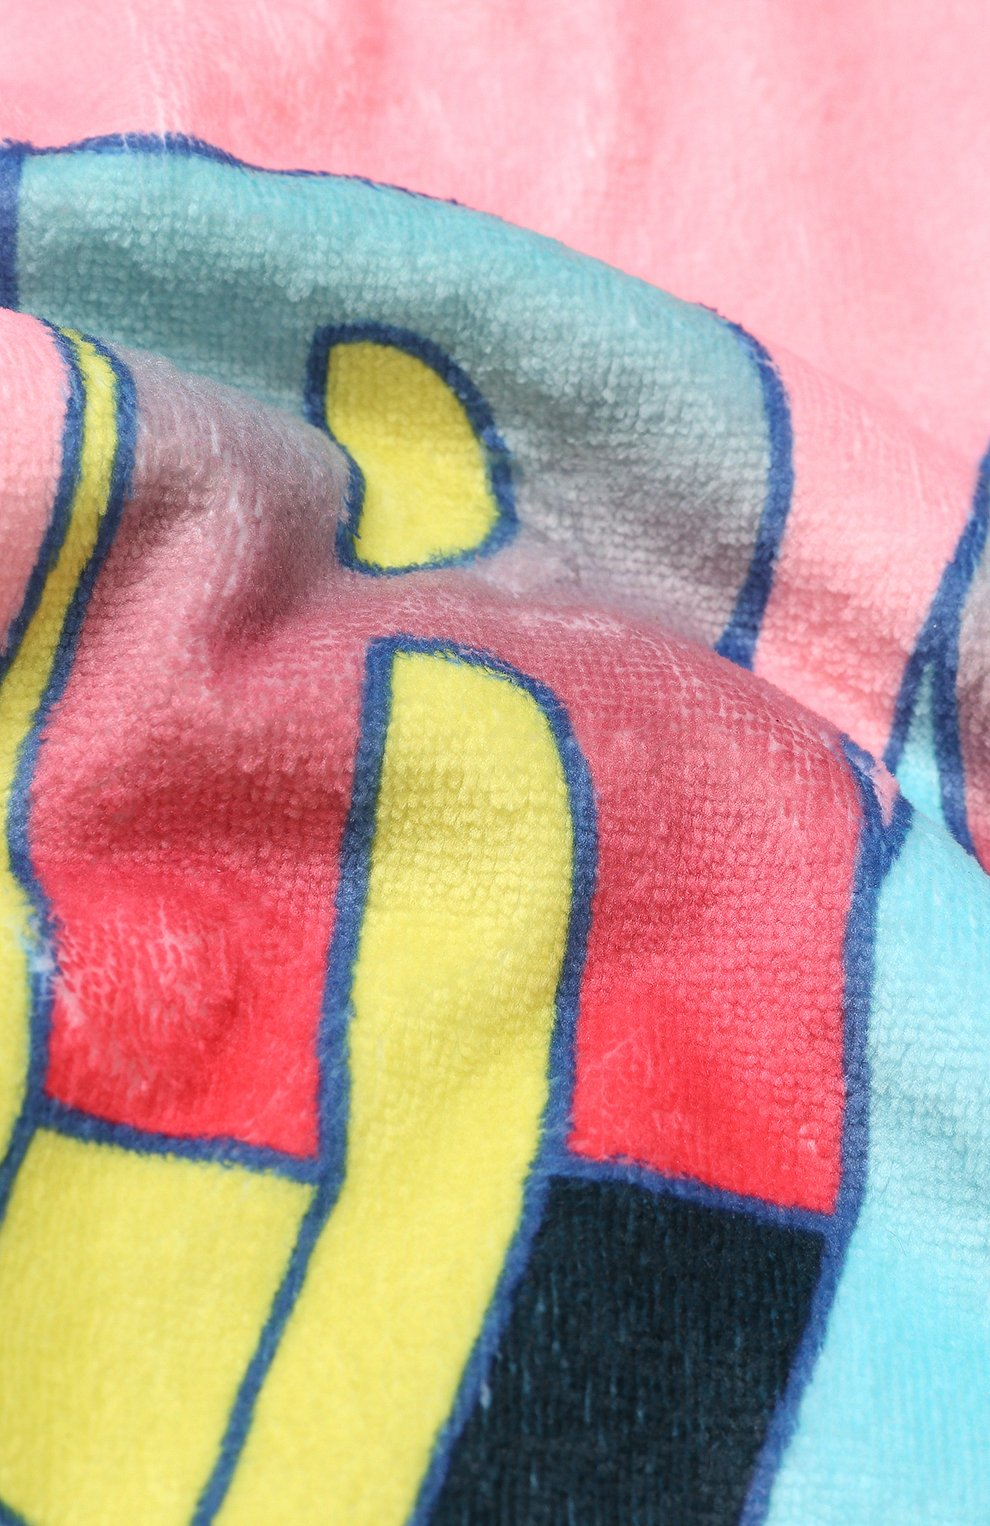 Детского пляжное полотенце с принтом MARC JACOBS (THE) розового цвета, арт. W10123 | Фото 2